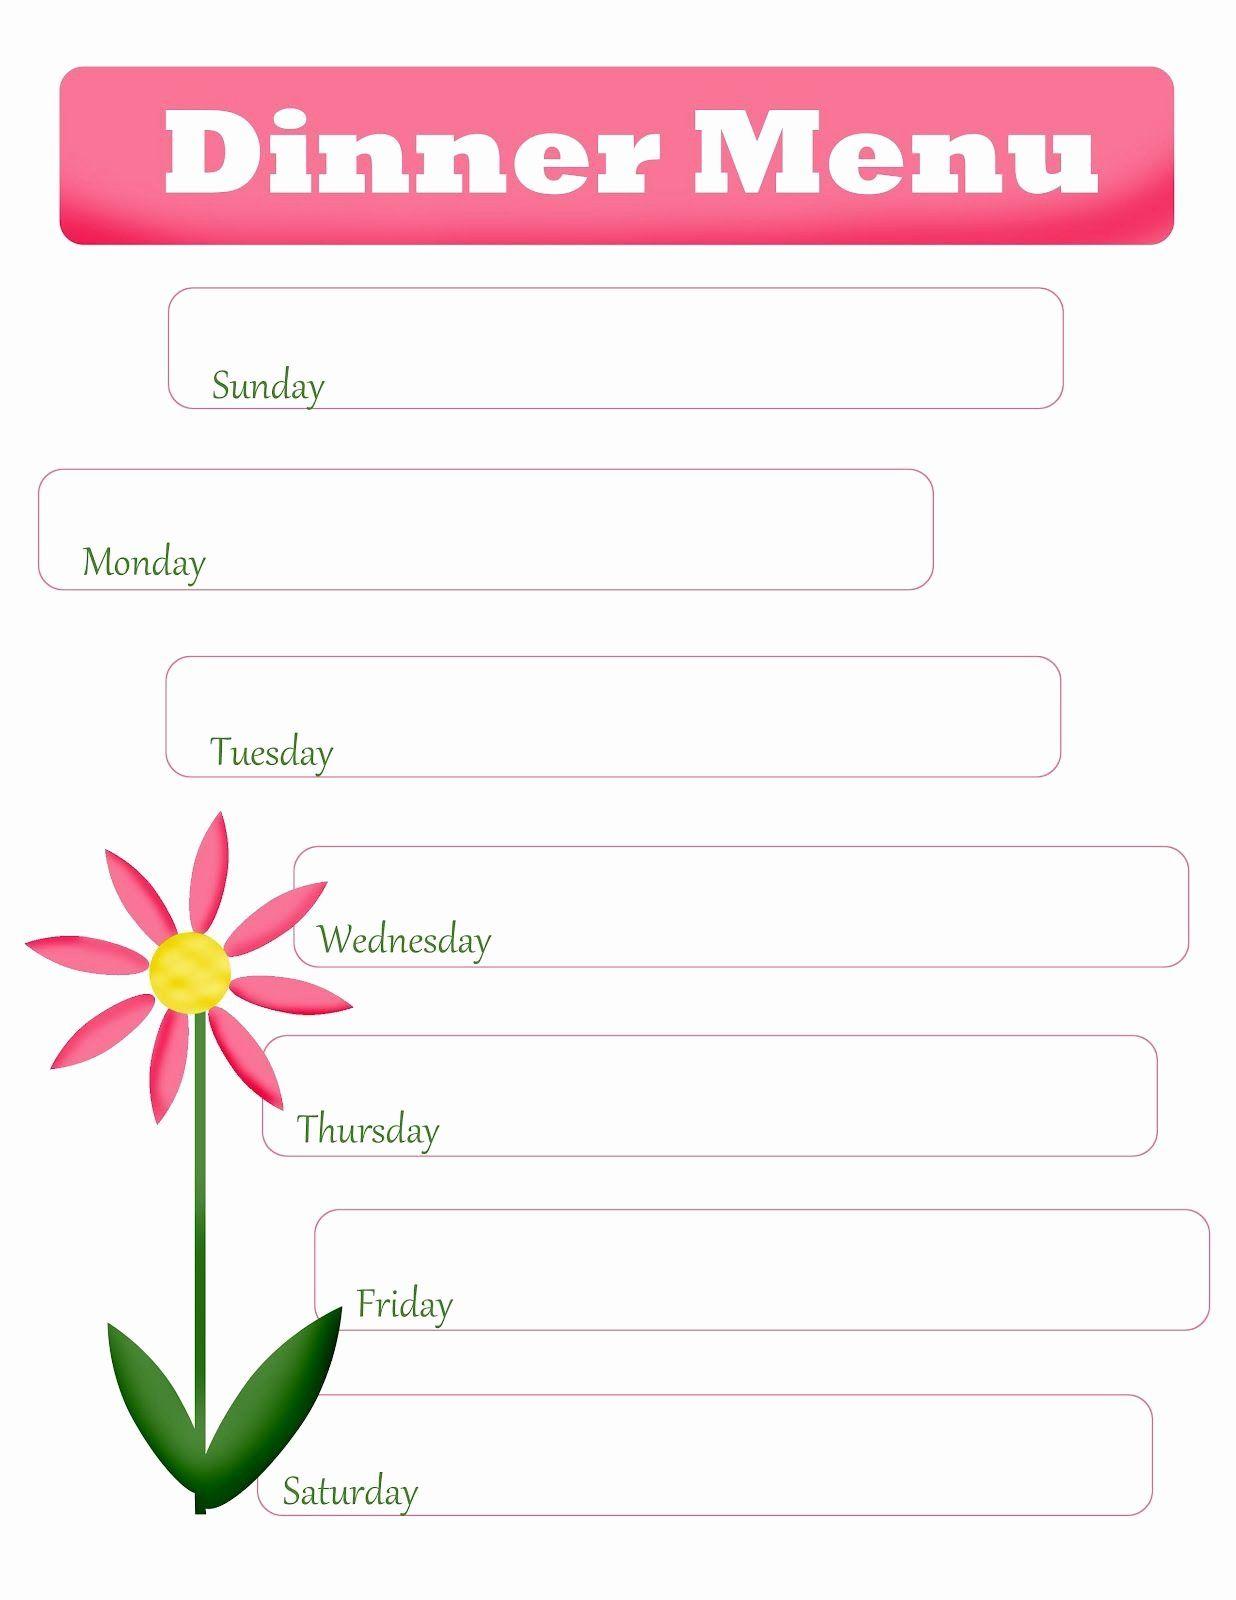 Free Printable Dinner Menu Templates Luxury Mom S Menu Planning Free Printable Blank Dinner Menu Spring Flower Rec Dinner Menu Weekly Dinner Menu Menu Template